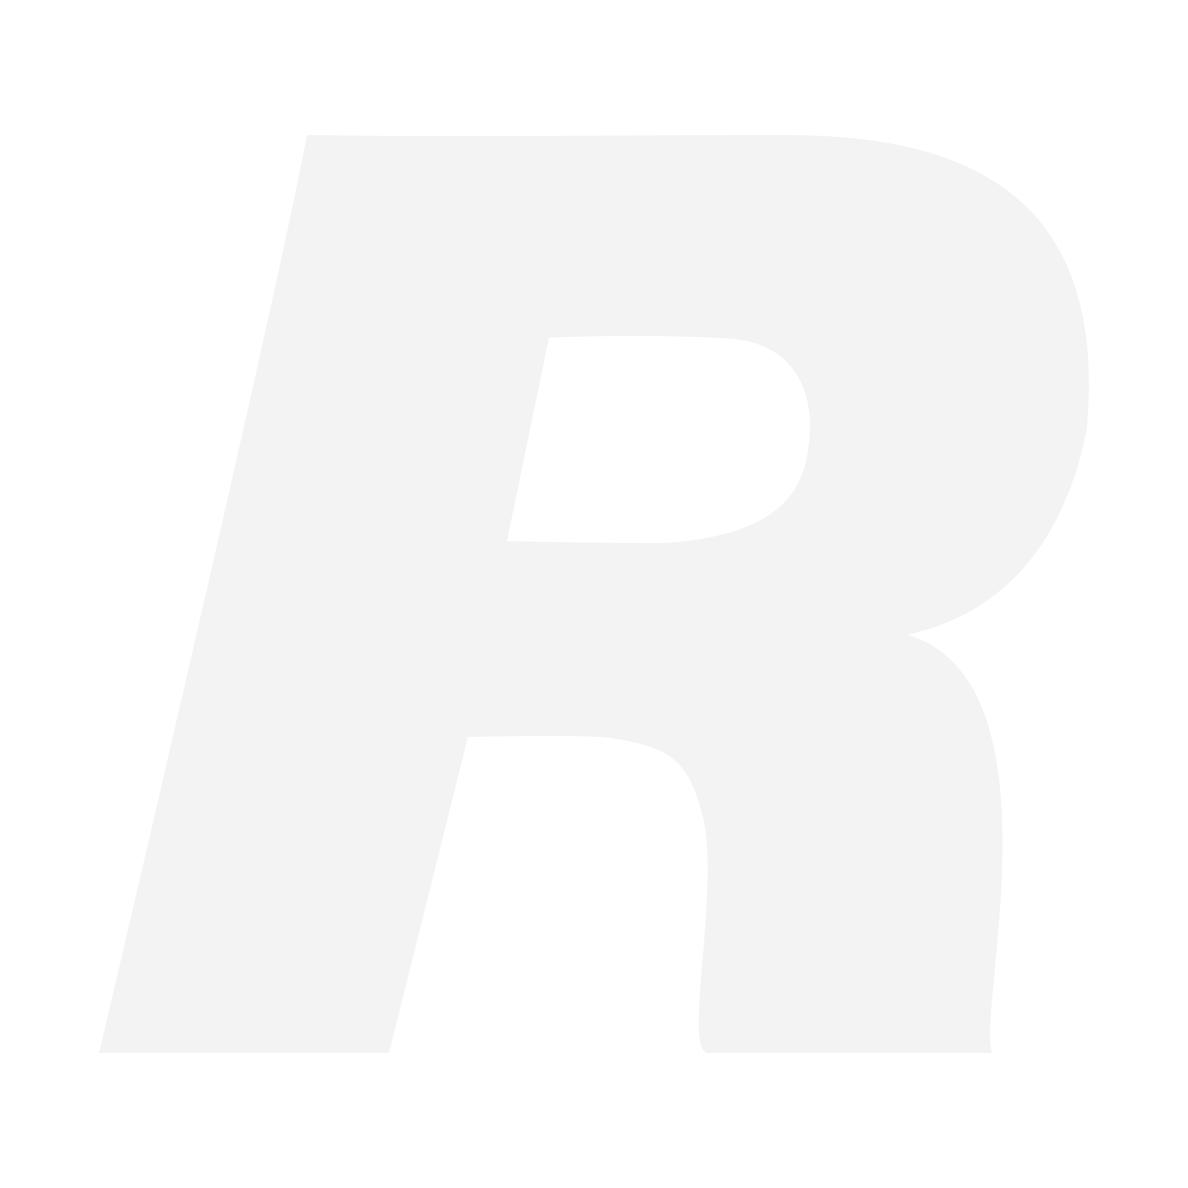 PANASONIC LEICA DG NOCTICRON 42.5mm f/1.2 G POWER OIS KÄYTETTY